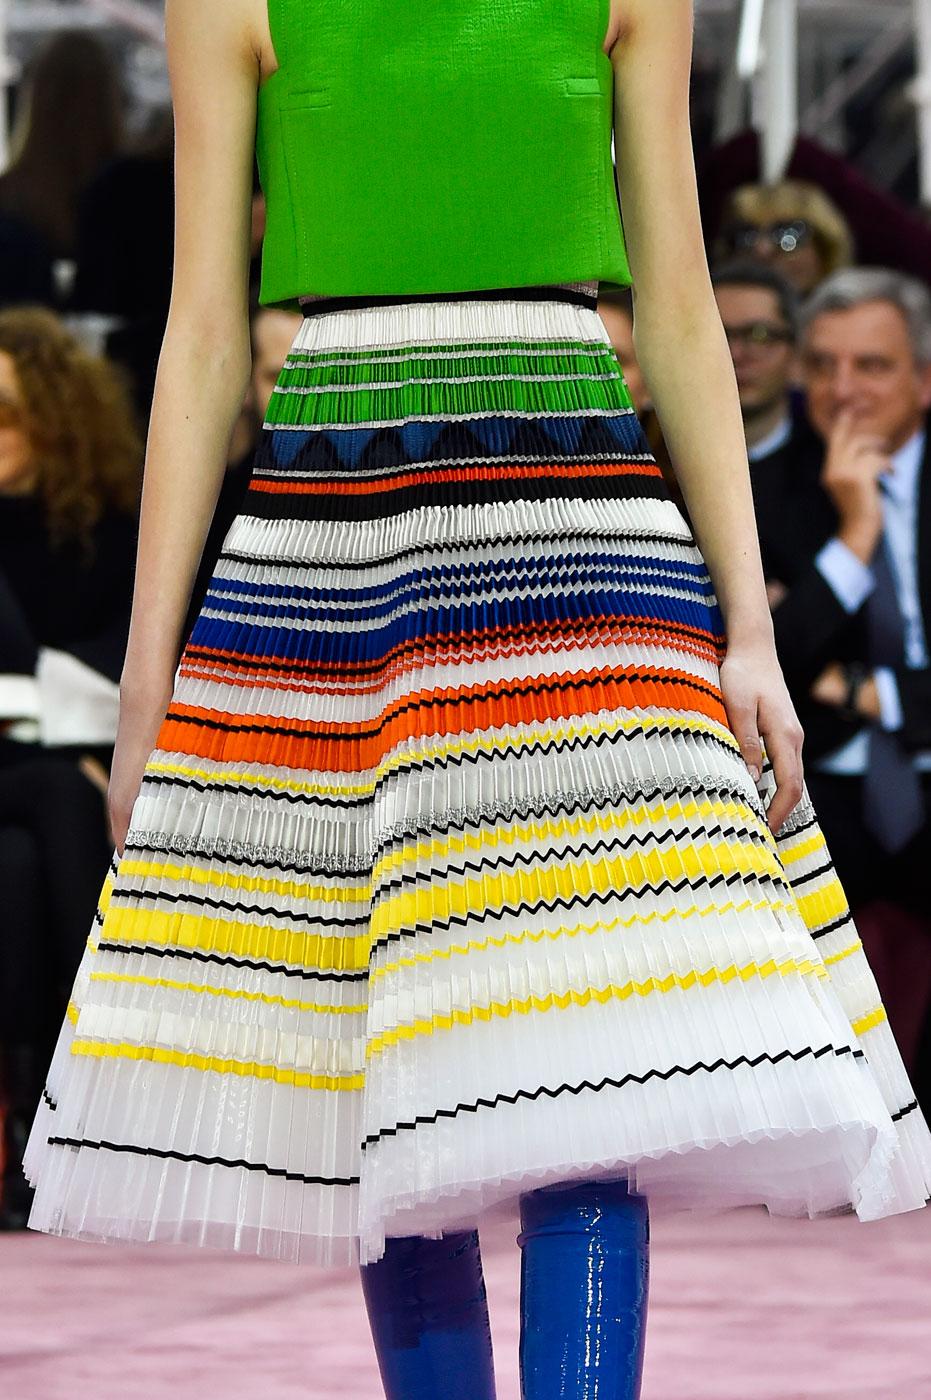 Christian-Dior-fashion-runway-show-close-ups-haute-couture-paris-spring-summer-2015-the-impression-128